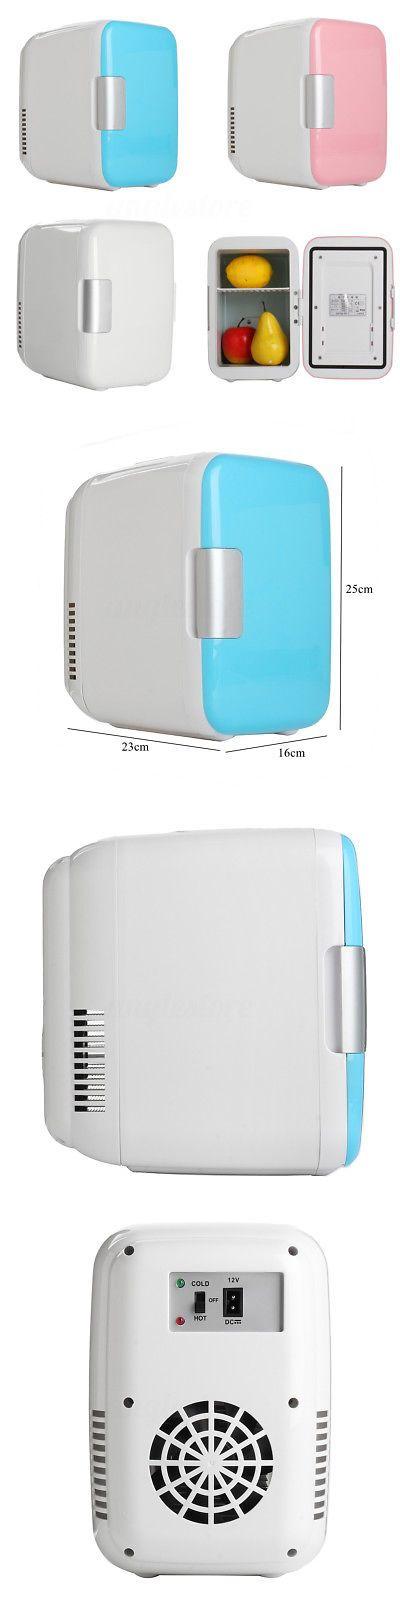 Mini Fridges 71262: Portable 4L Refrigerator Fridge Cooler Warmer Car Freezer Boat Home Office Us -> BUY IT NOW ONLY: $30.99 on eBay!